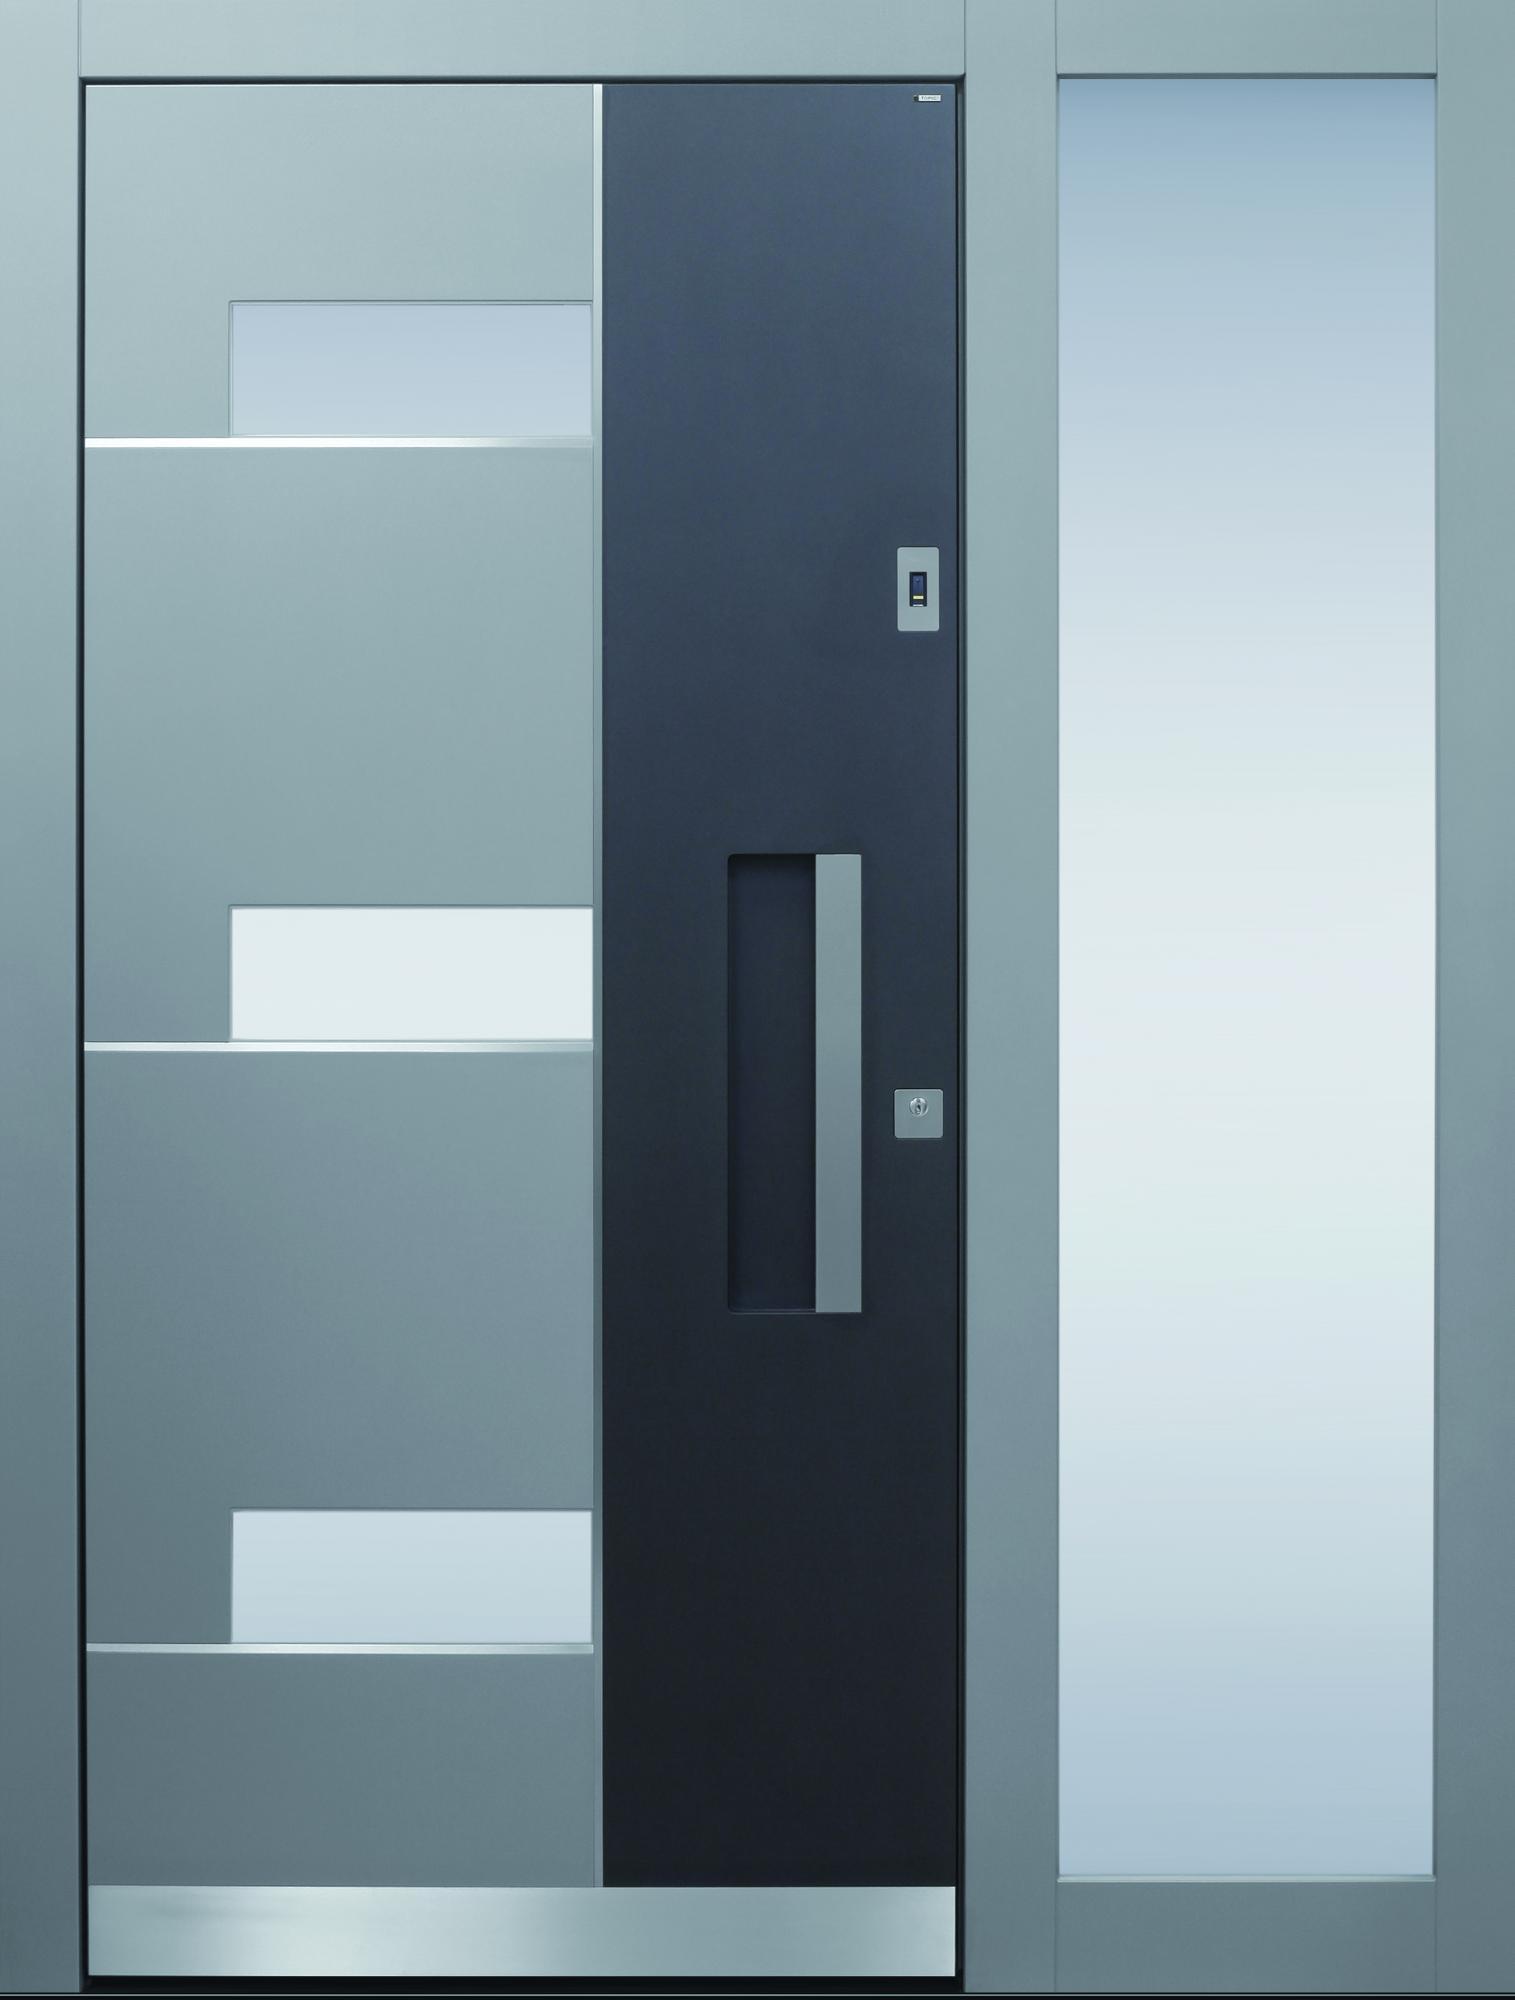 Haustüren modern anthrazit  TOPIC - Haustüren von Meisterhand TOPIC Haustüren u. Wohnungstüren ...